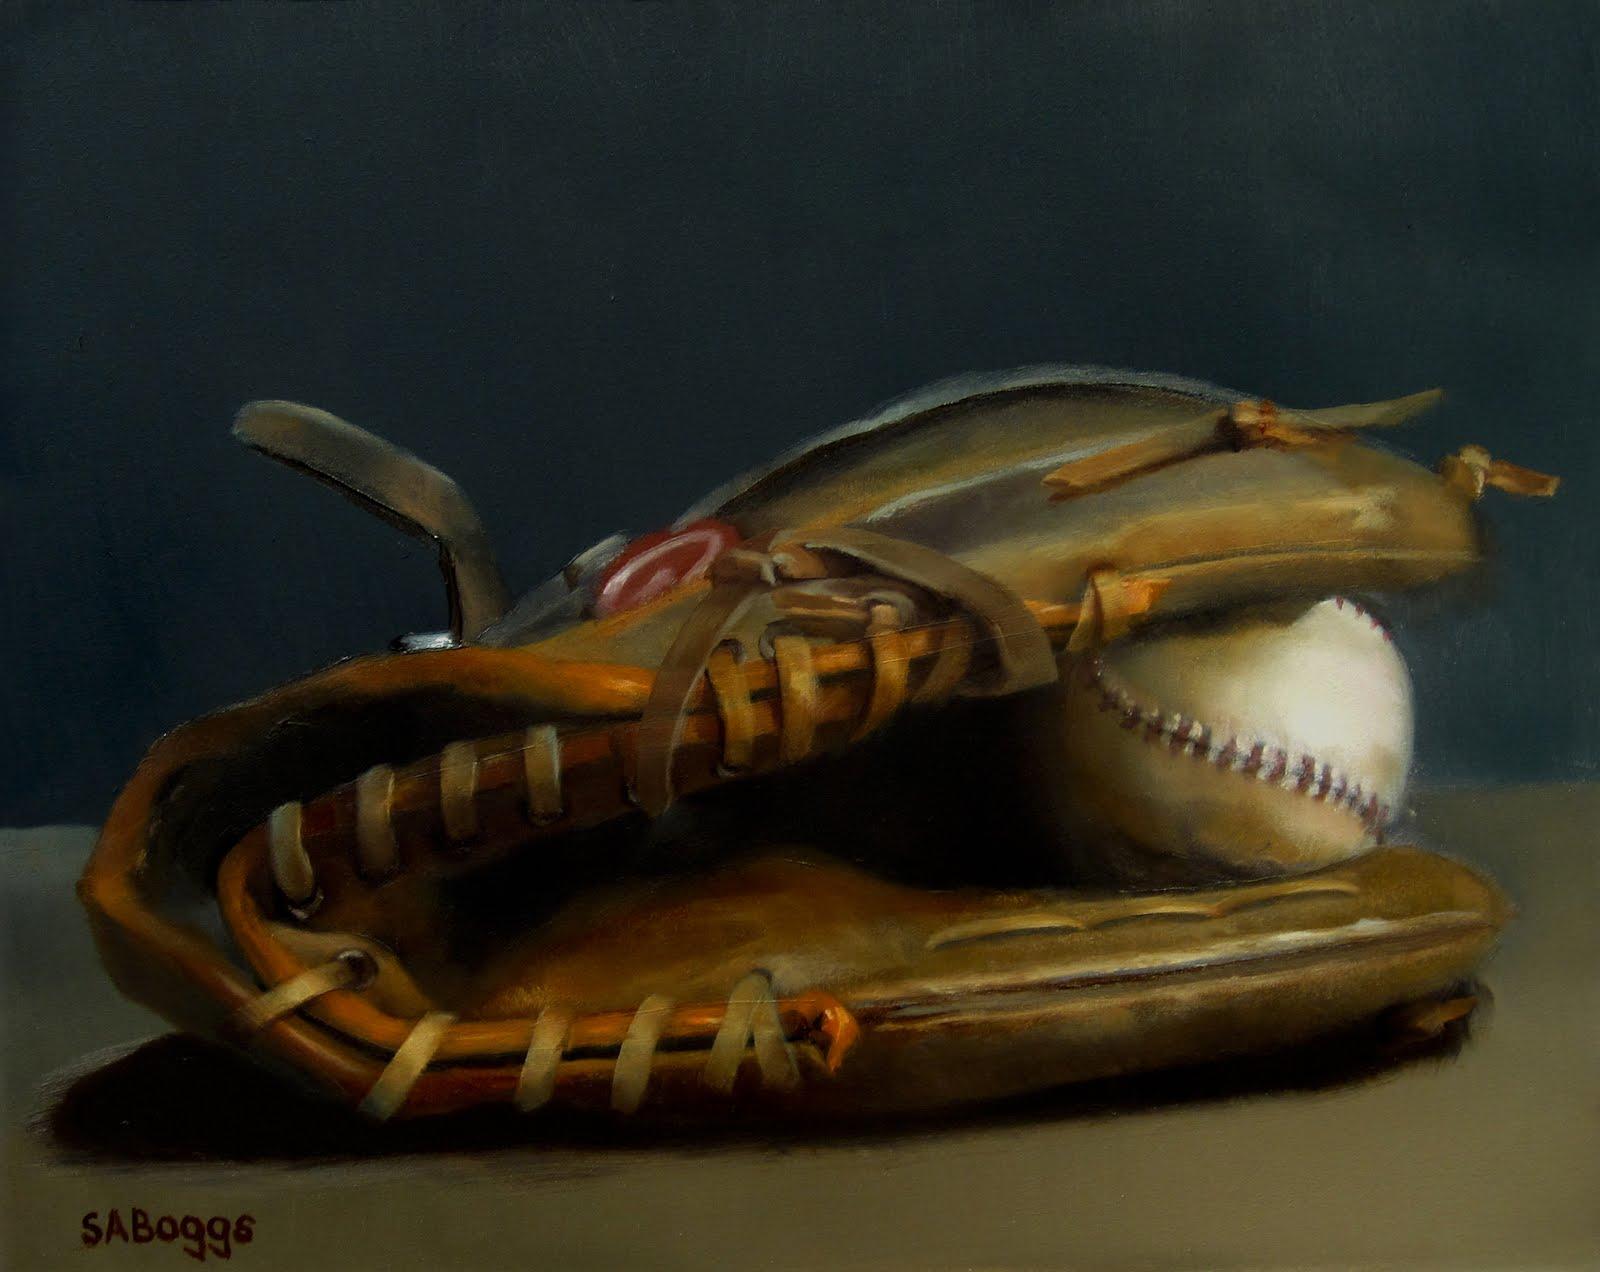 Baseball Glove Paint : The artwork of steven allen boggs daily painting still